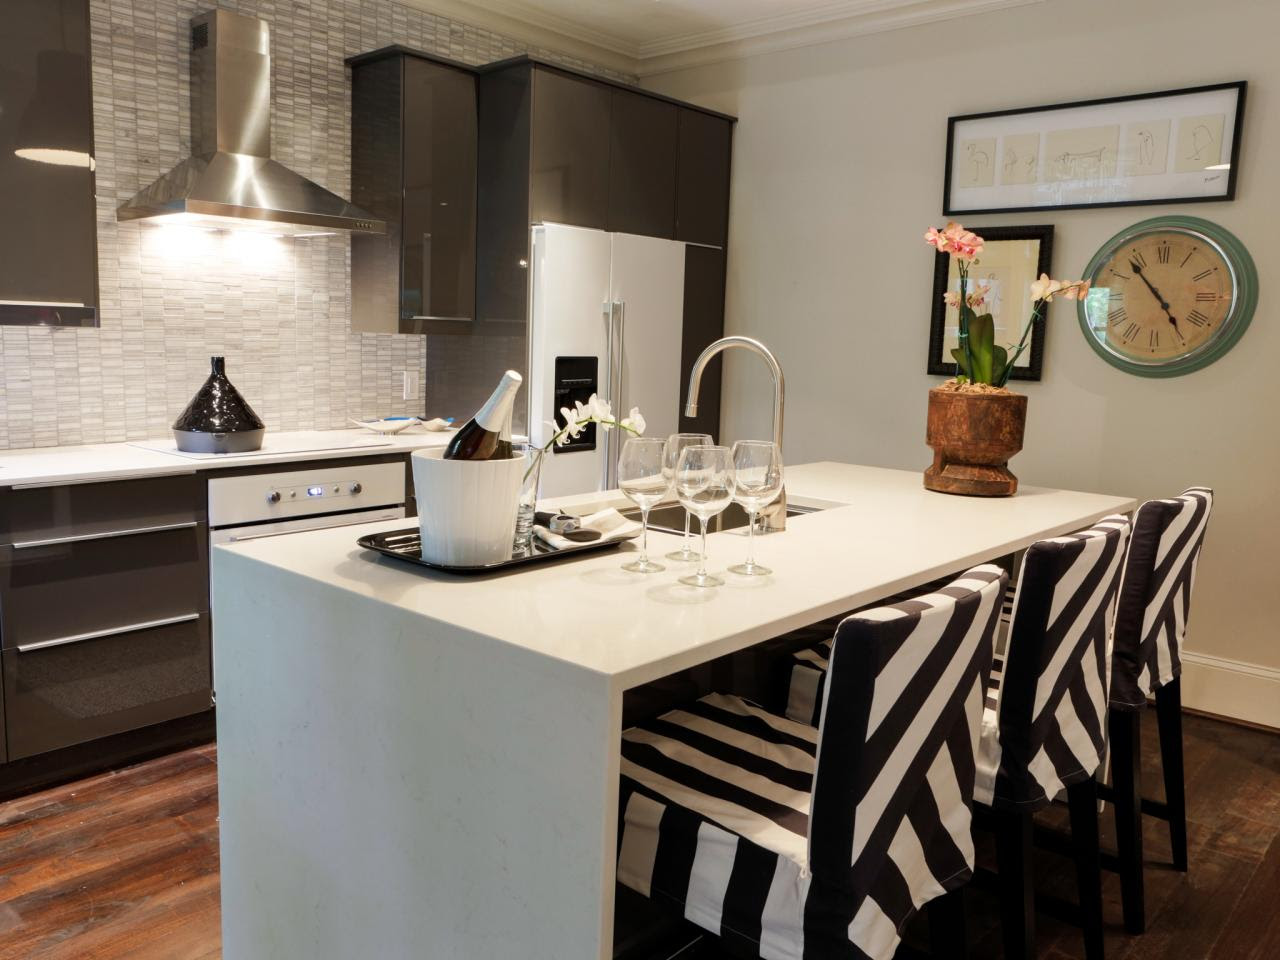 Modern Small Kitchen Designs With Island